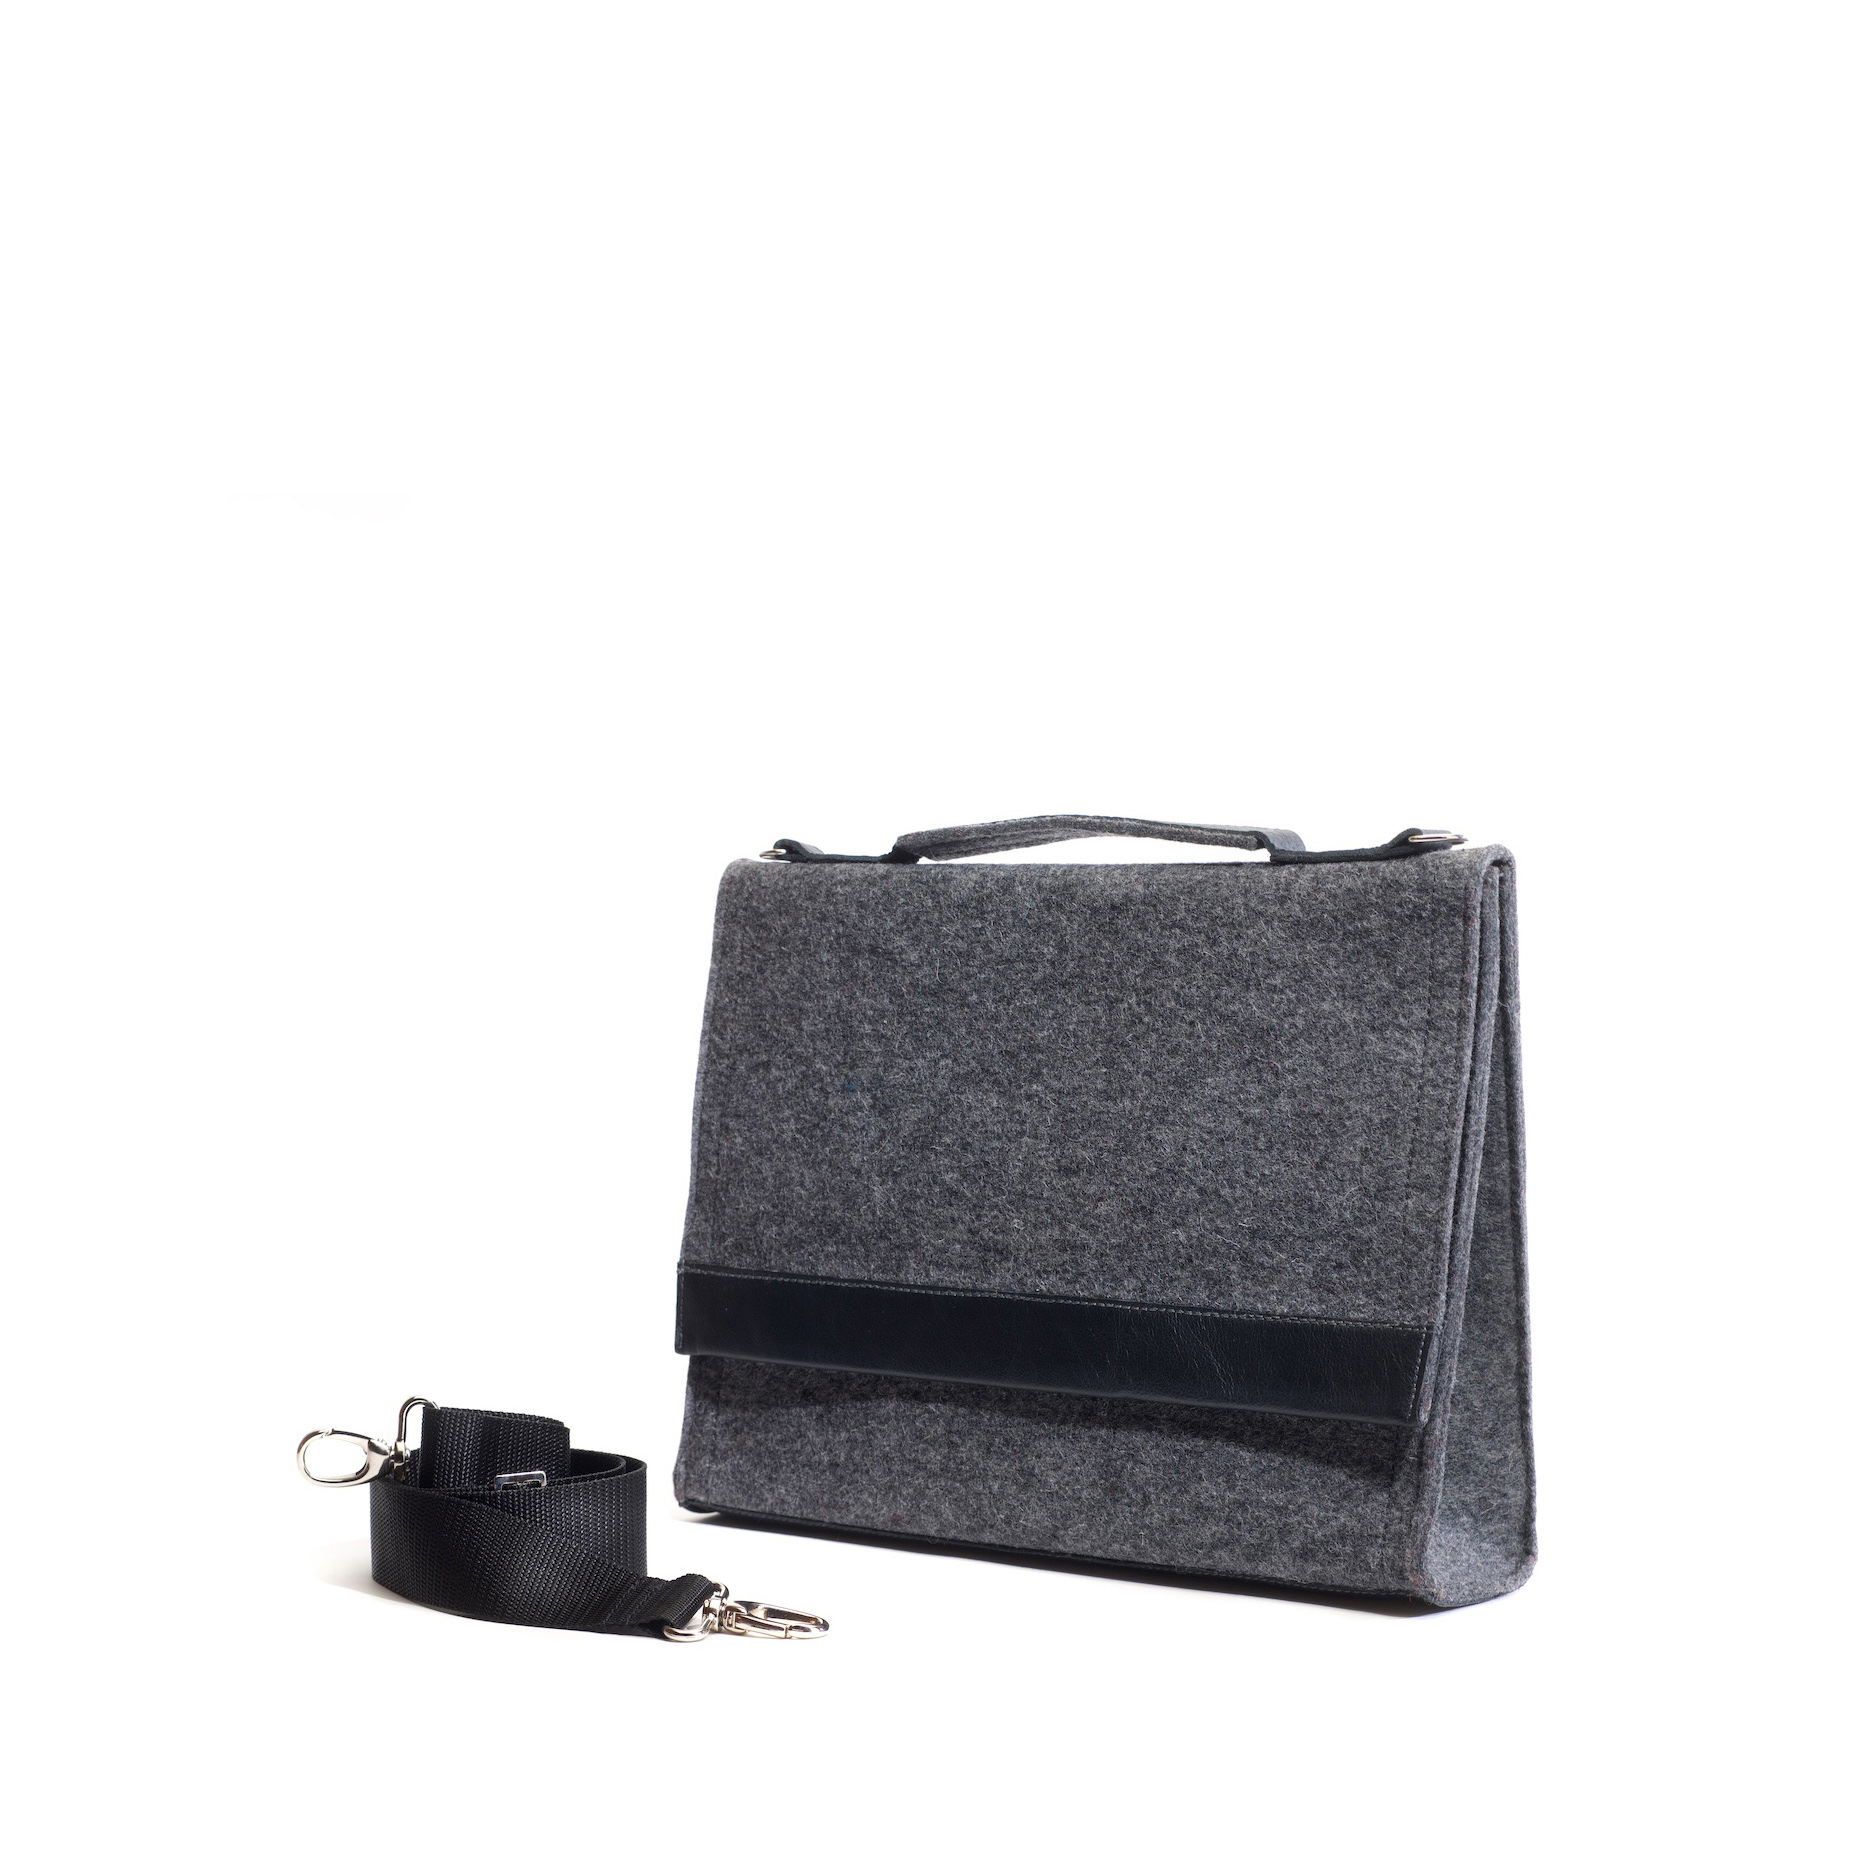 Handtasche-Sophie in Granit-Schwarz